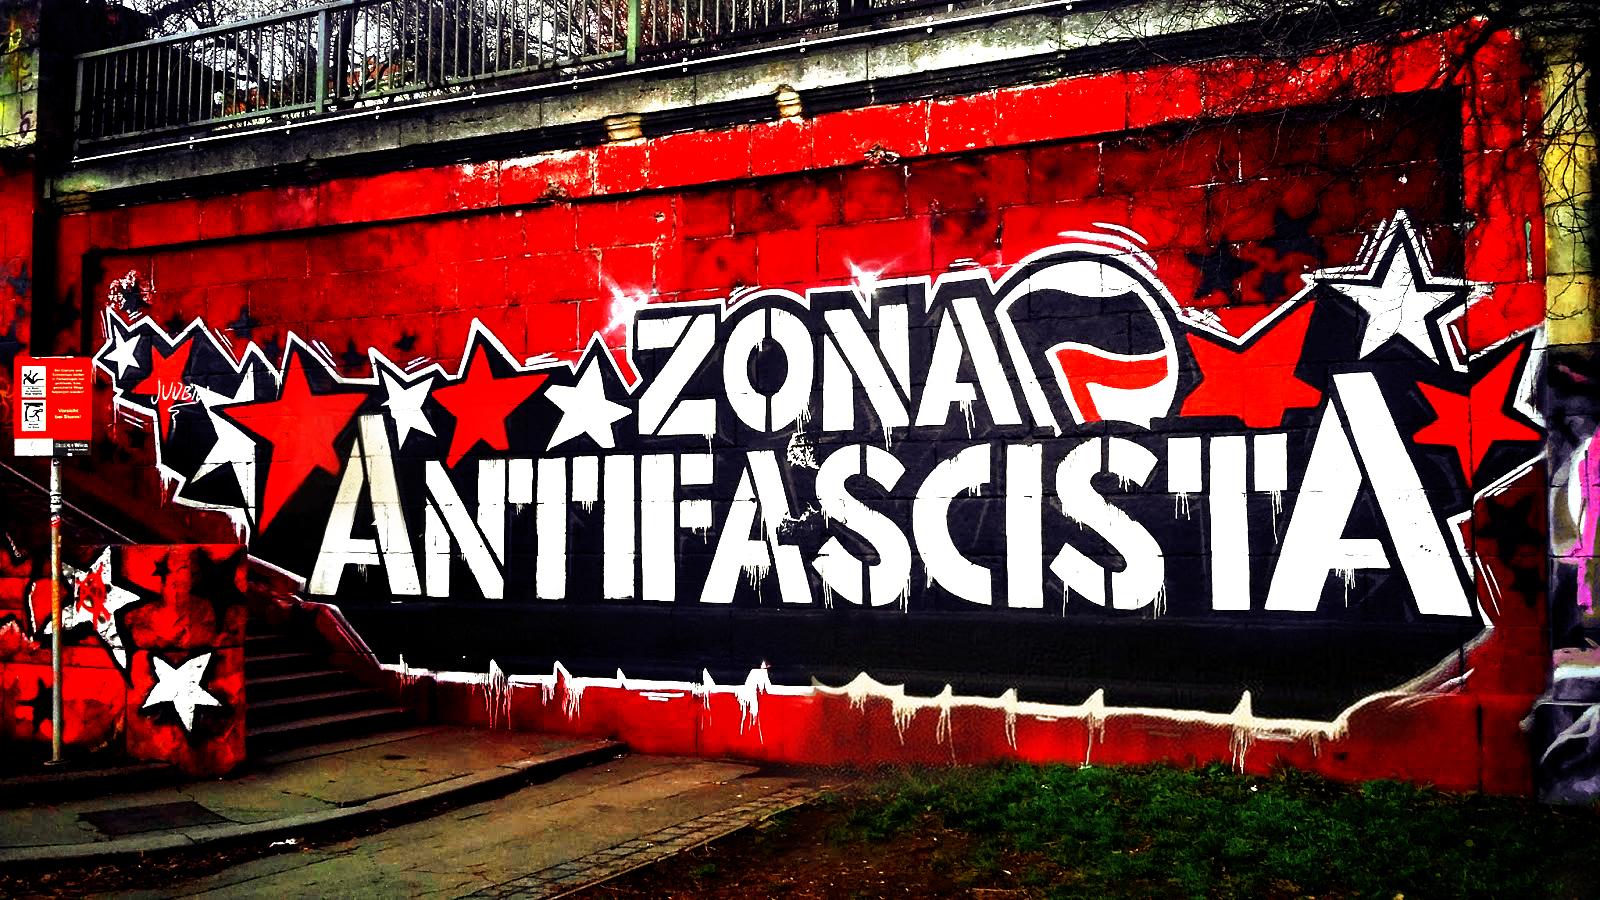 26.05.2017 - Serata Antifascista 1